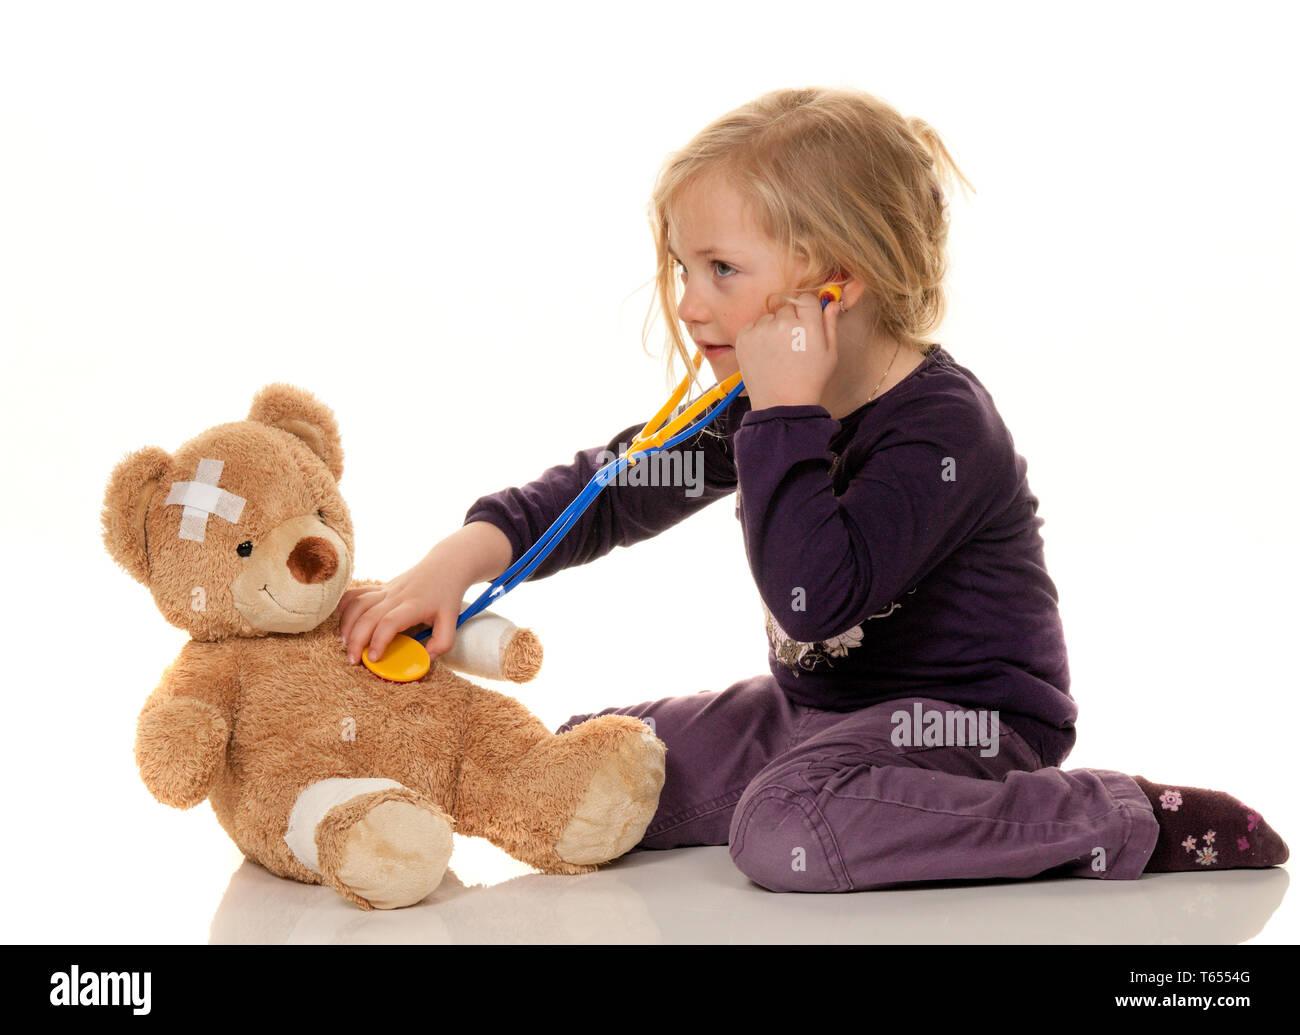 pediatrician symbol photo - Stock Image